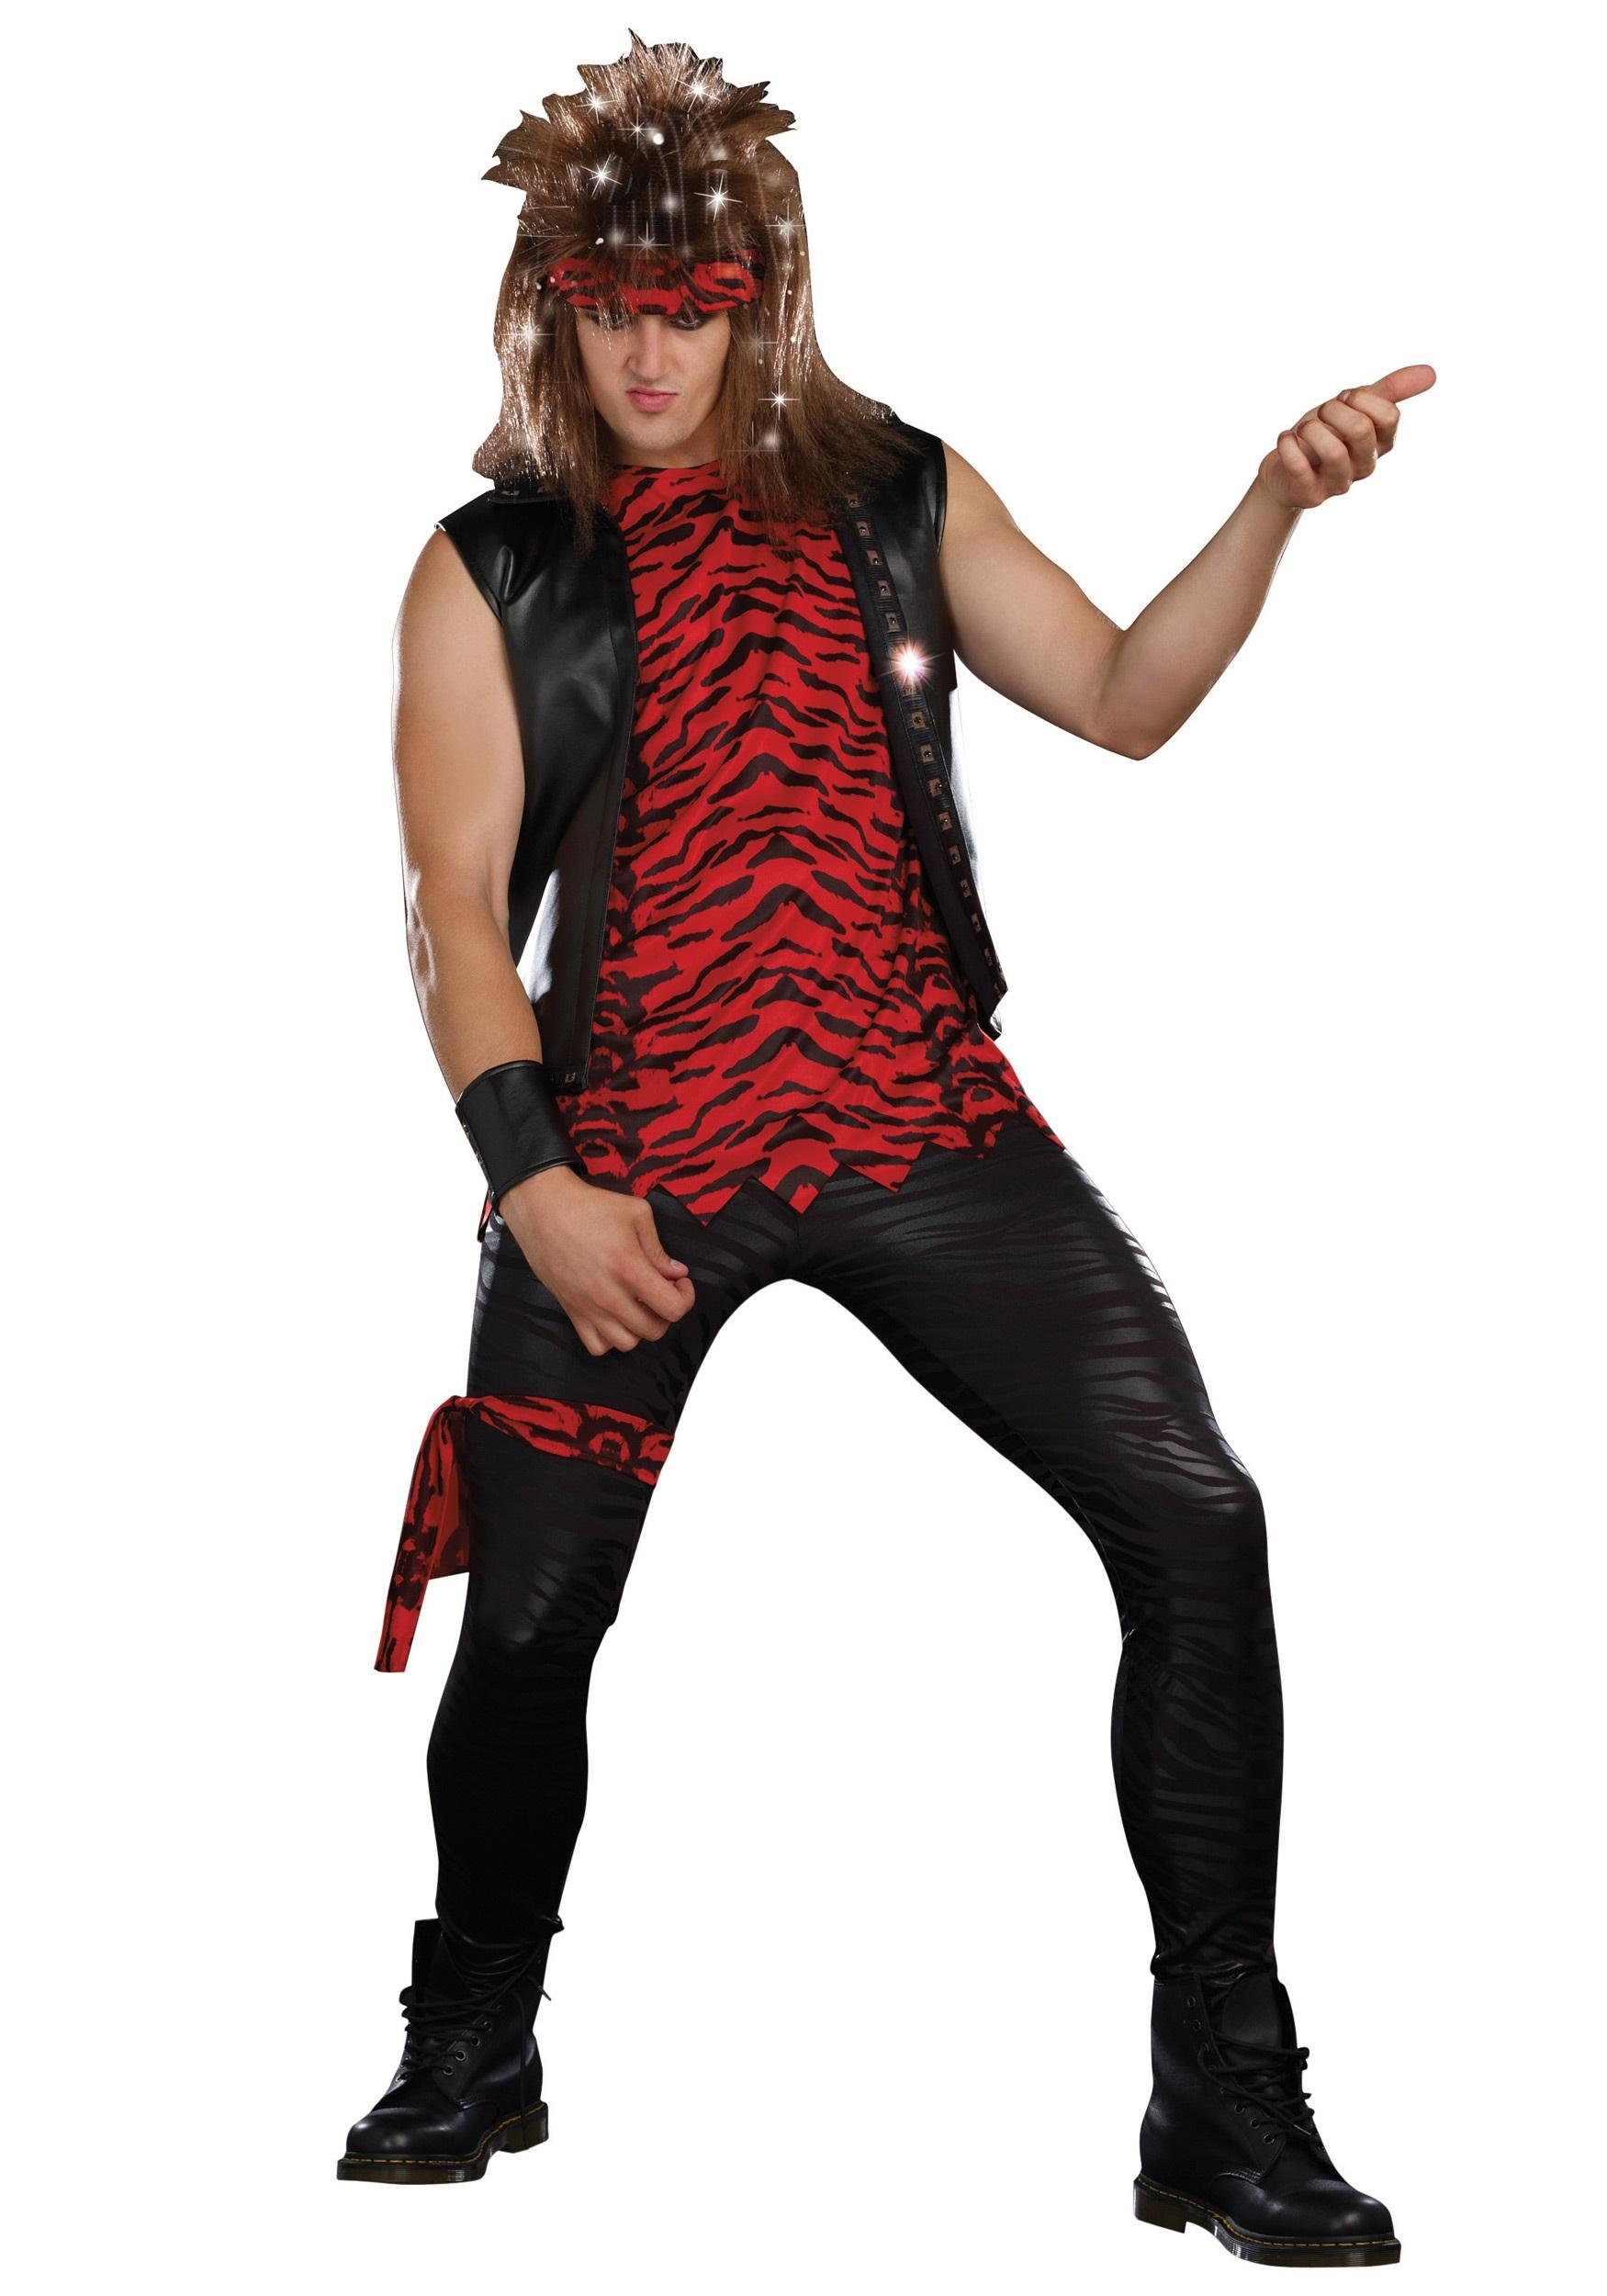 Male Rockstar Costume - Halloween Costumes